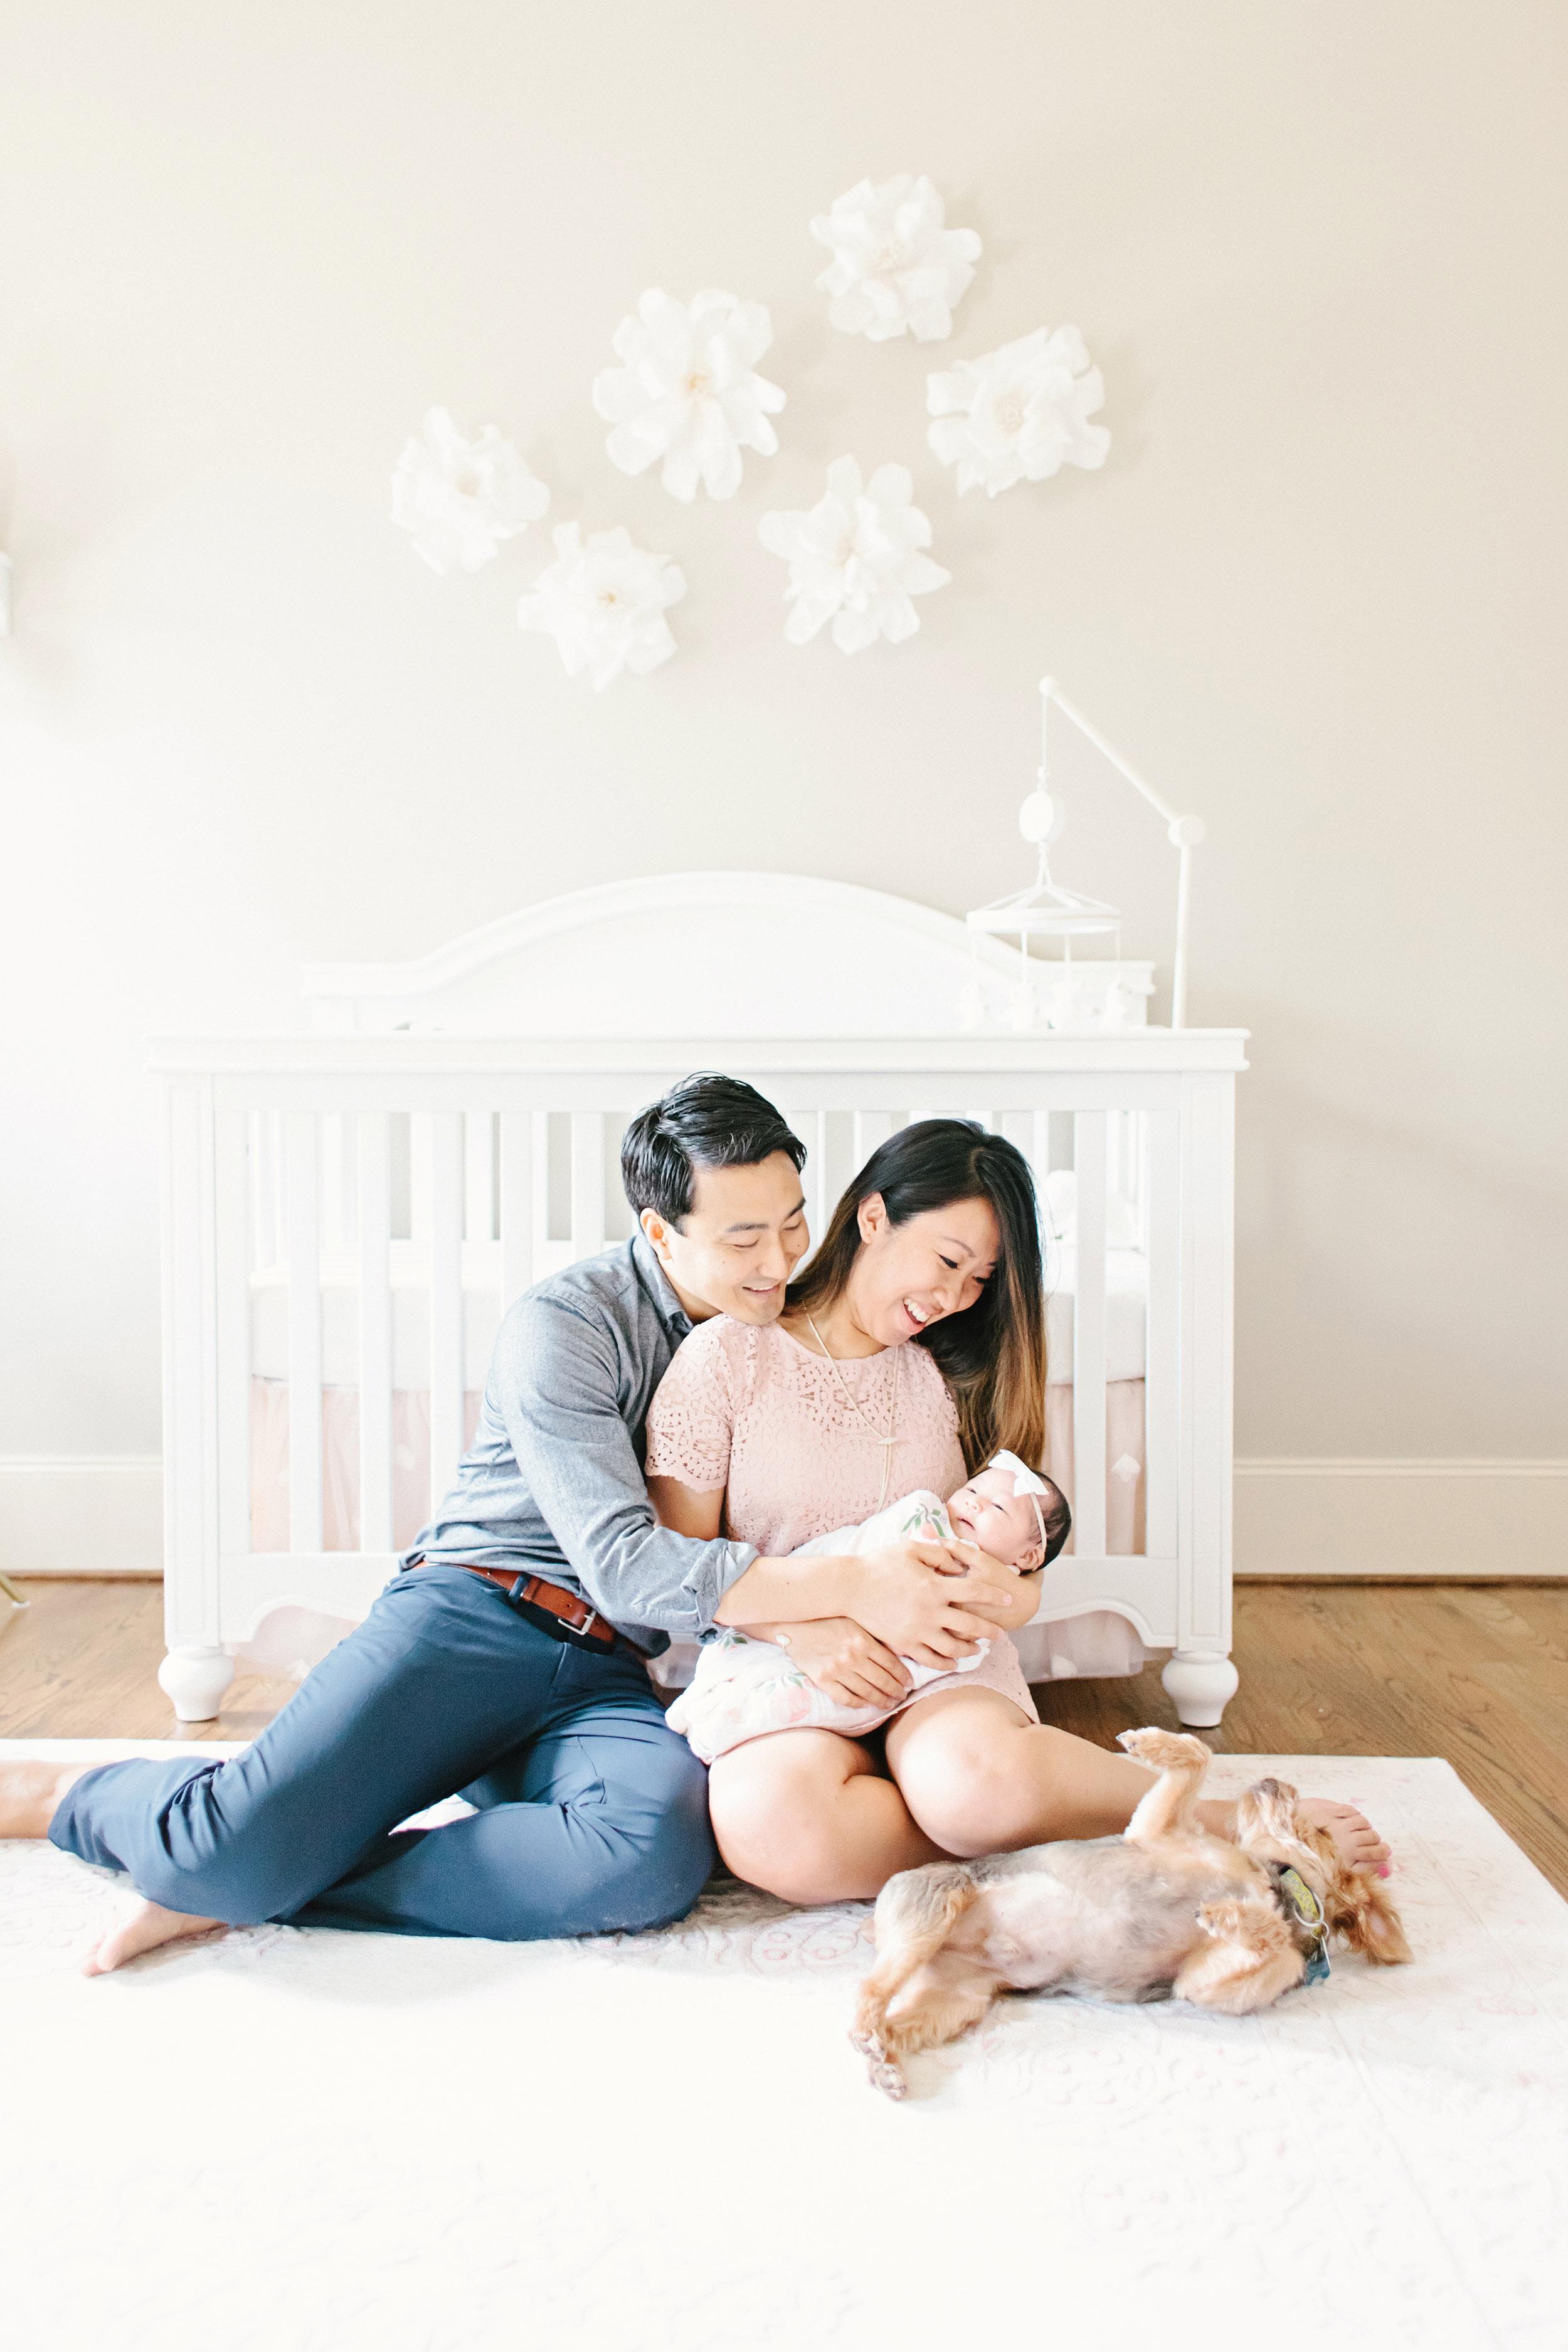 Houston Lifestyle Newborn Photography_Nursery Inspiration_Crib_Paper Flowers